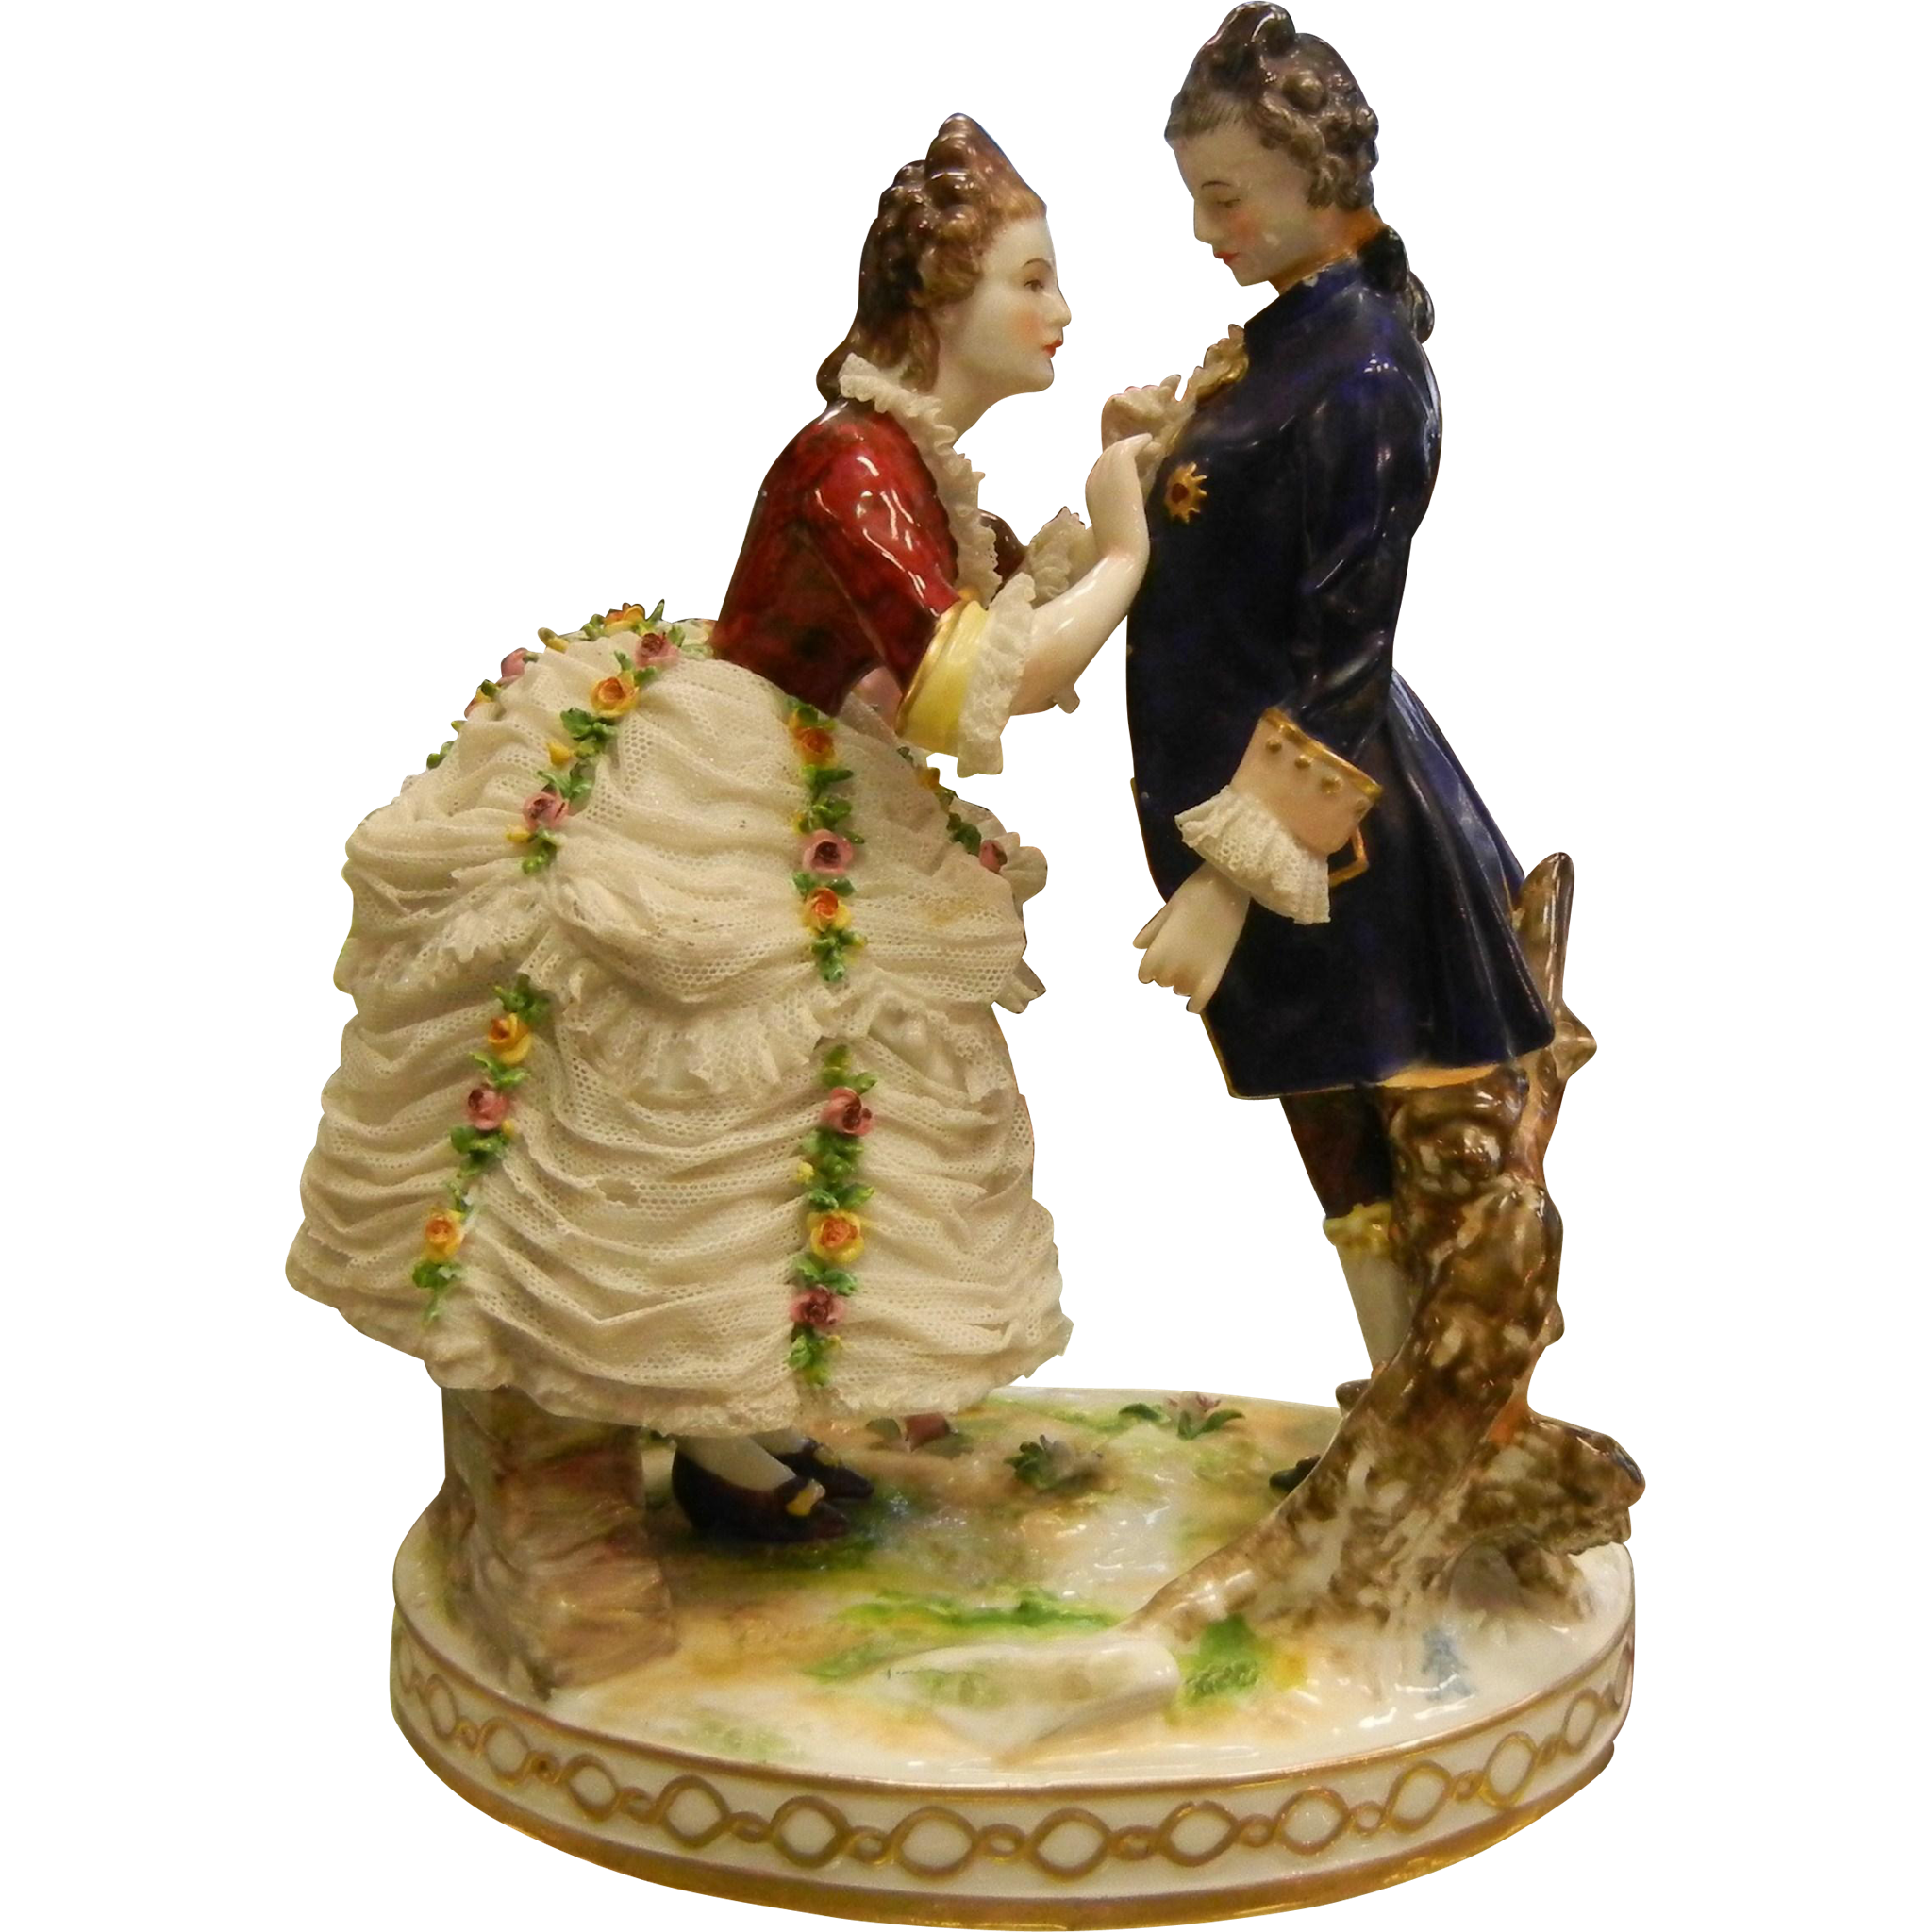 Antique Signed German Porcelain Couple Figurine